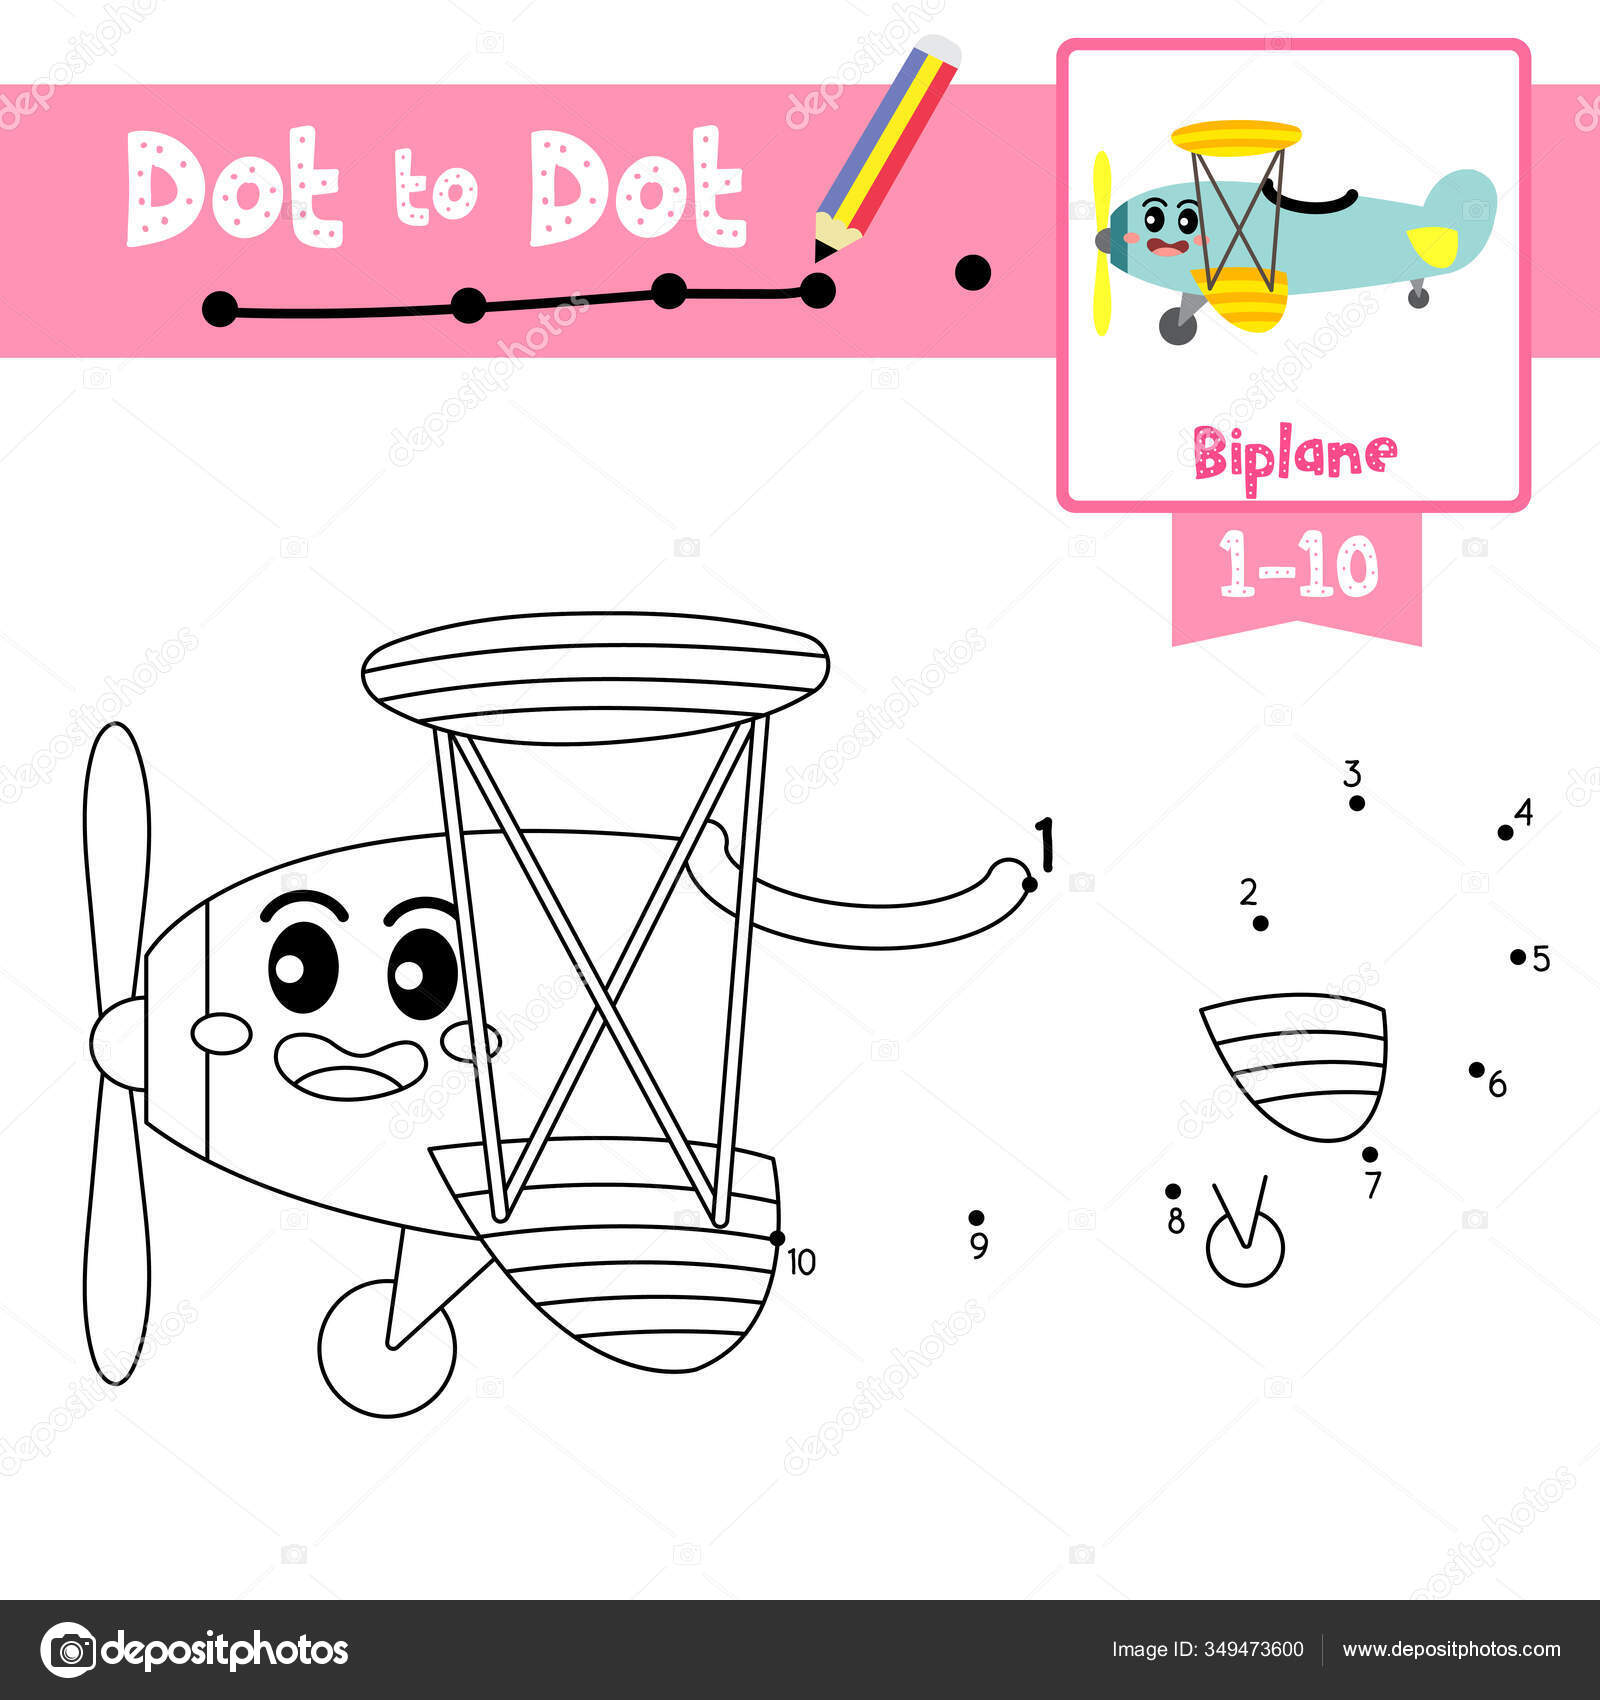 Dot Dot Educational Game Coloring Book Cute Biplane Cartoon Transportations Stock Vector C Natchapohn 349473600